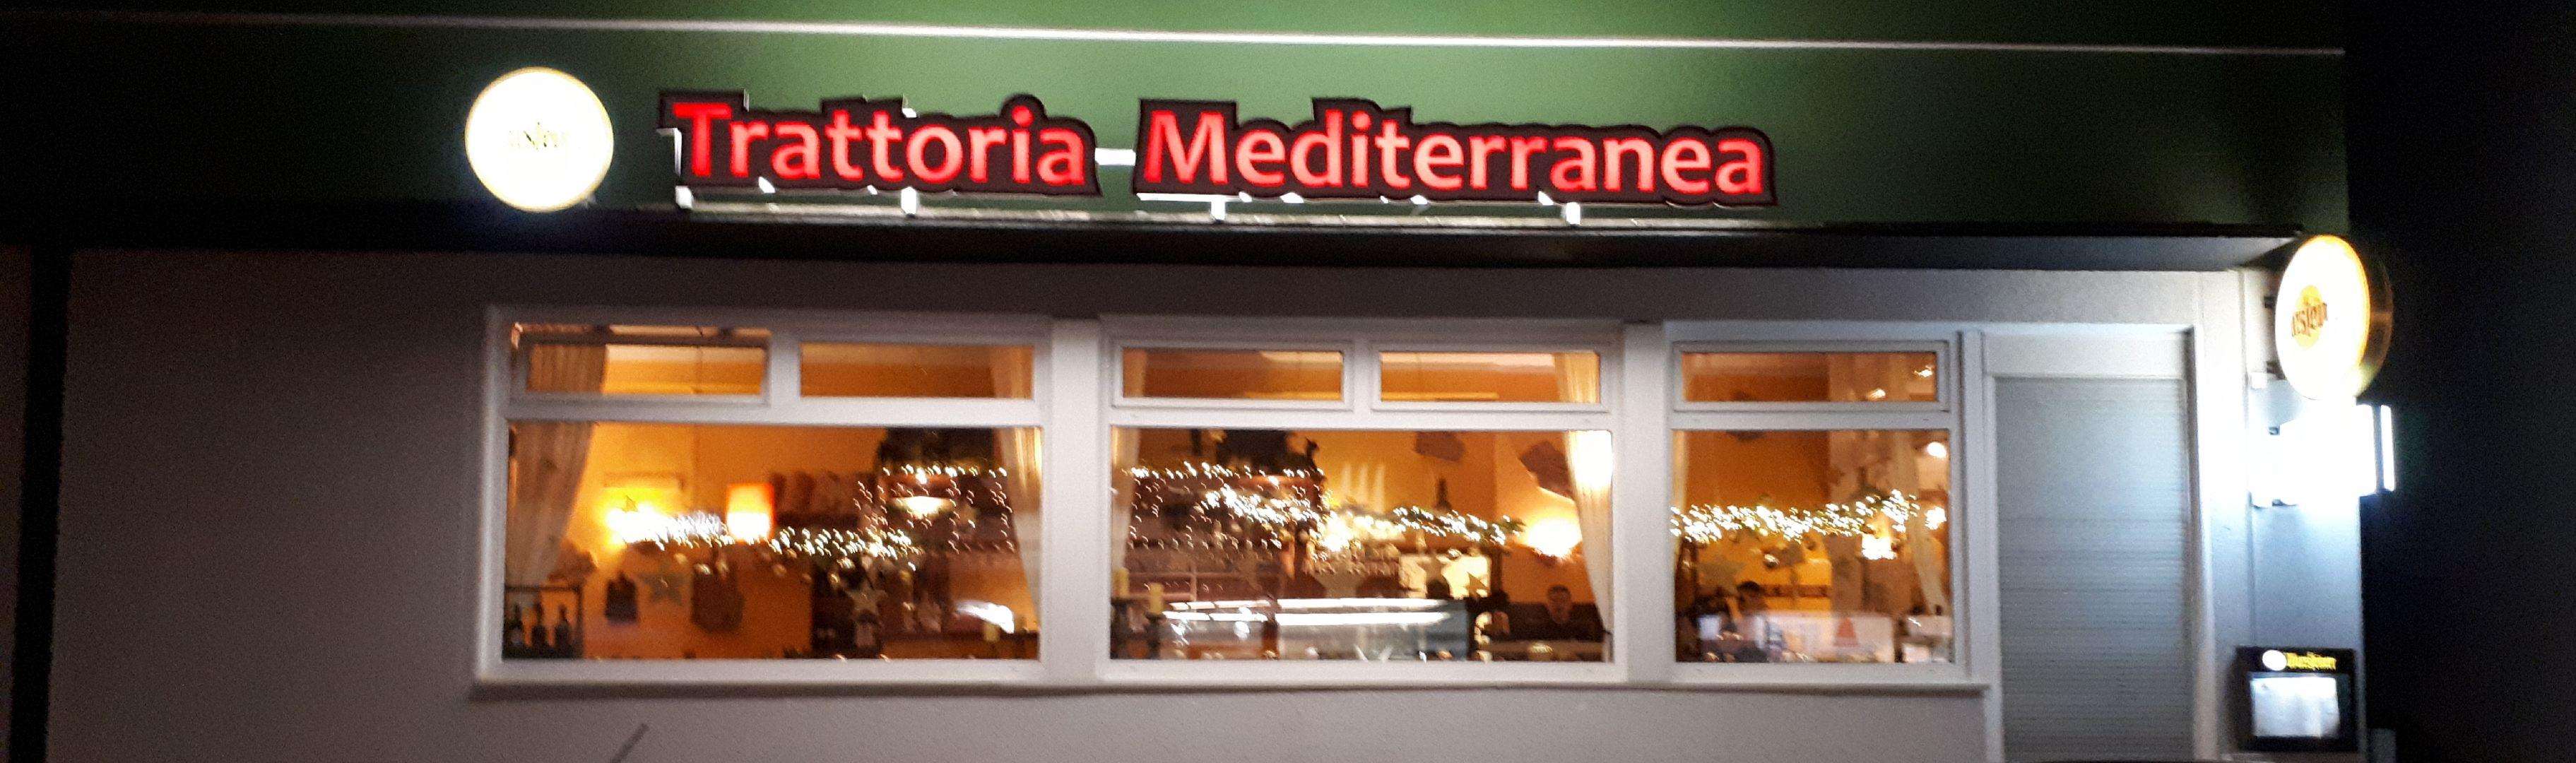 Trattoria Mediterranea   ISG Solingen-Ohligs e.V.